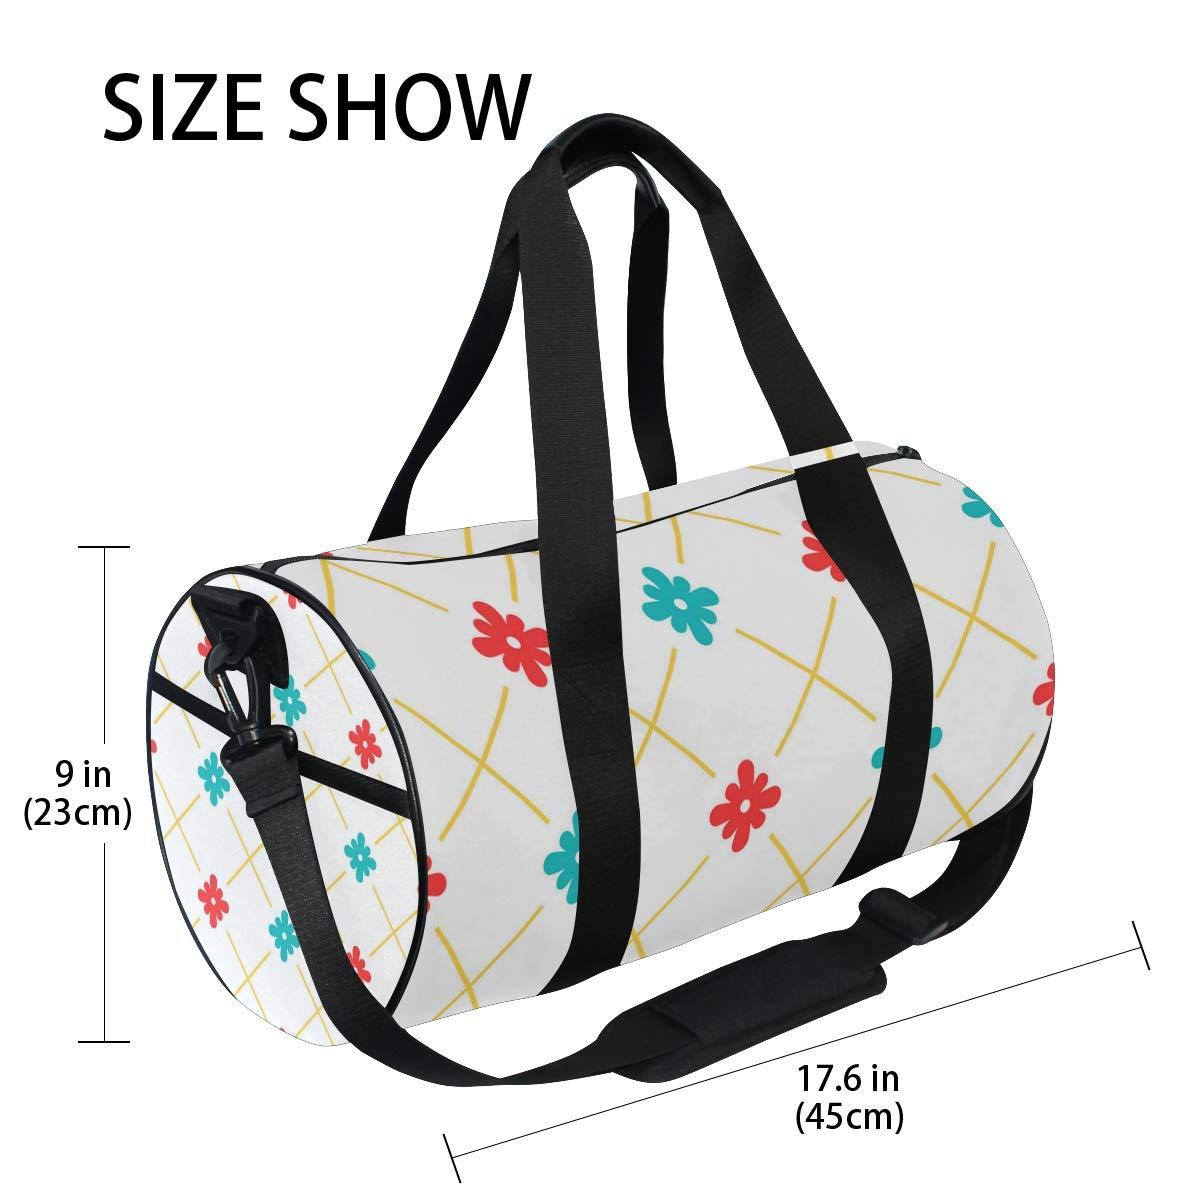 White Square Ceramic PictureWaterproof Non-Slip Wearable Crossbody Bag fitness bag Shoulder Bag